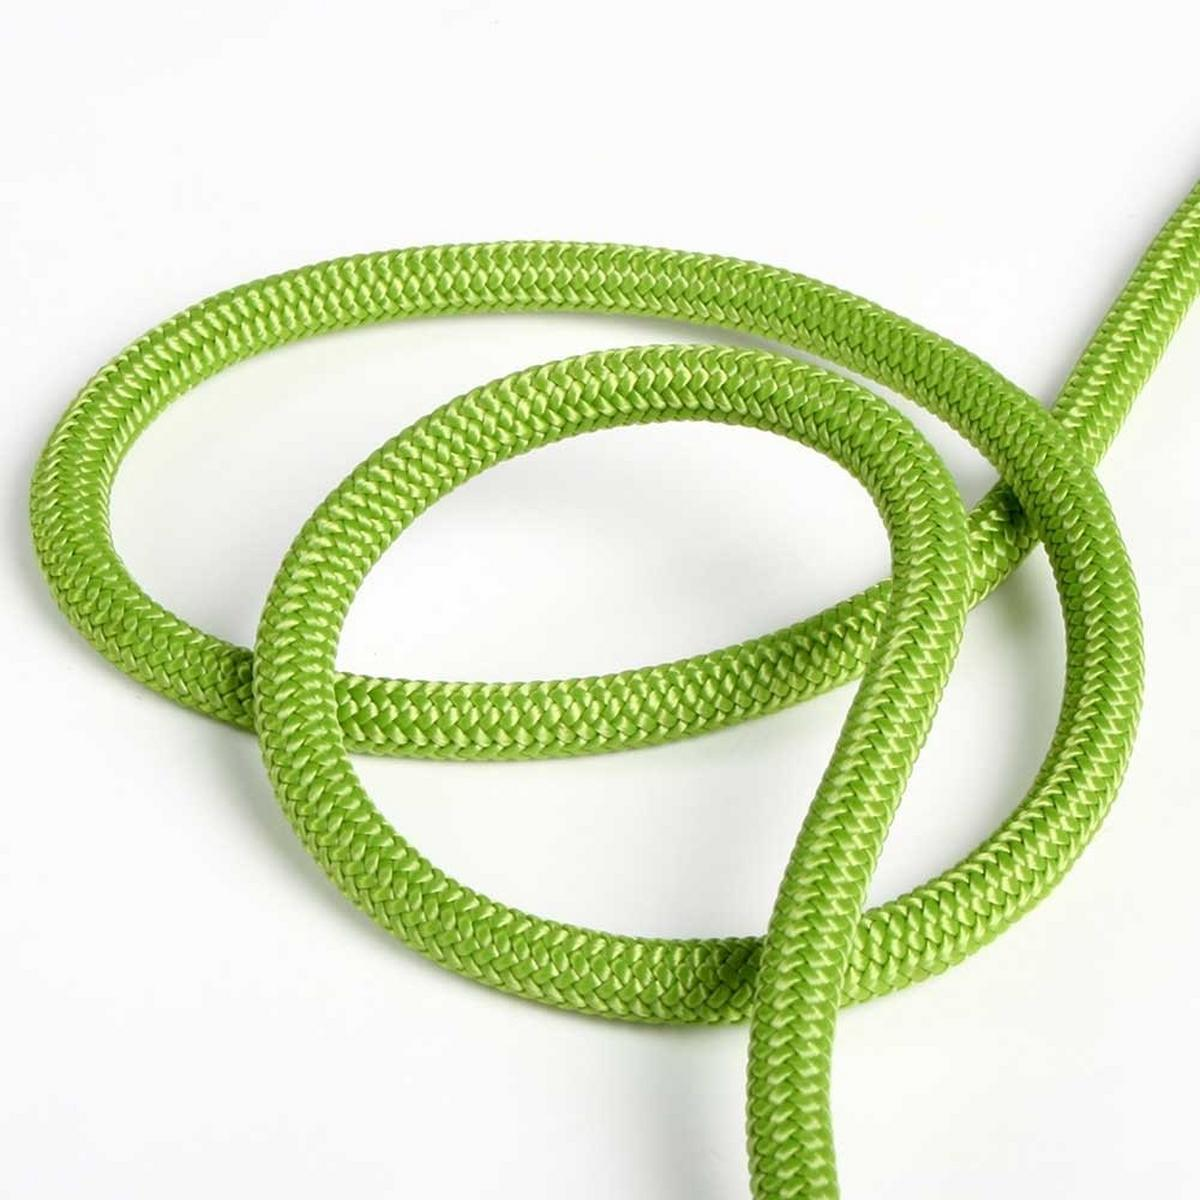 Edelweis 6mm x 5m Rope - Green